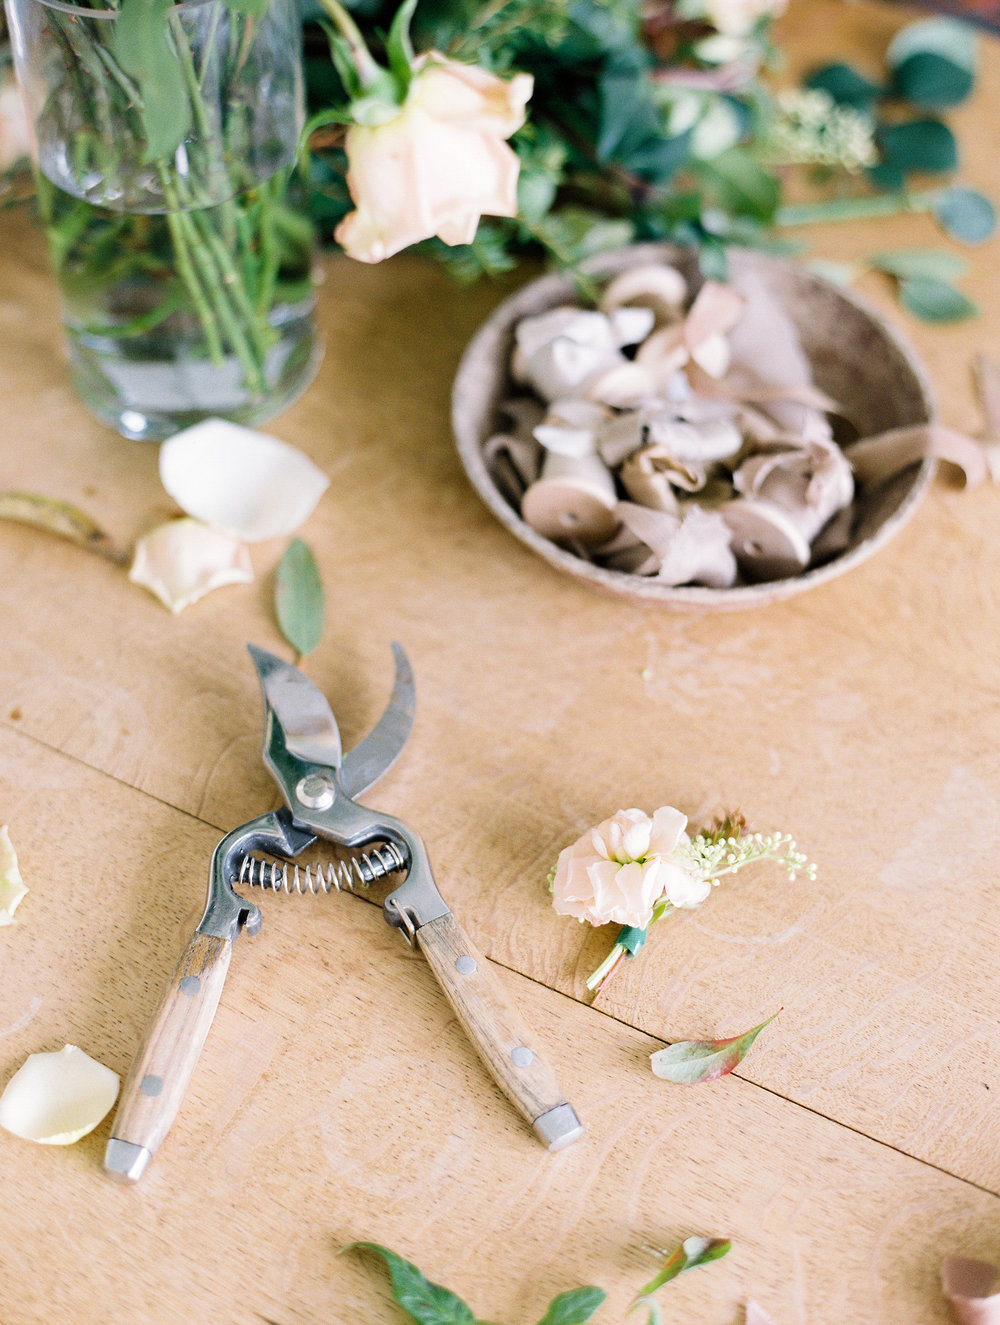 sandra-chau-stylist-floral-florist-branding-lifestyle-shoot-we-are-origami169.jpg